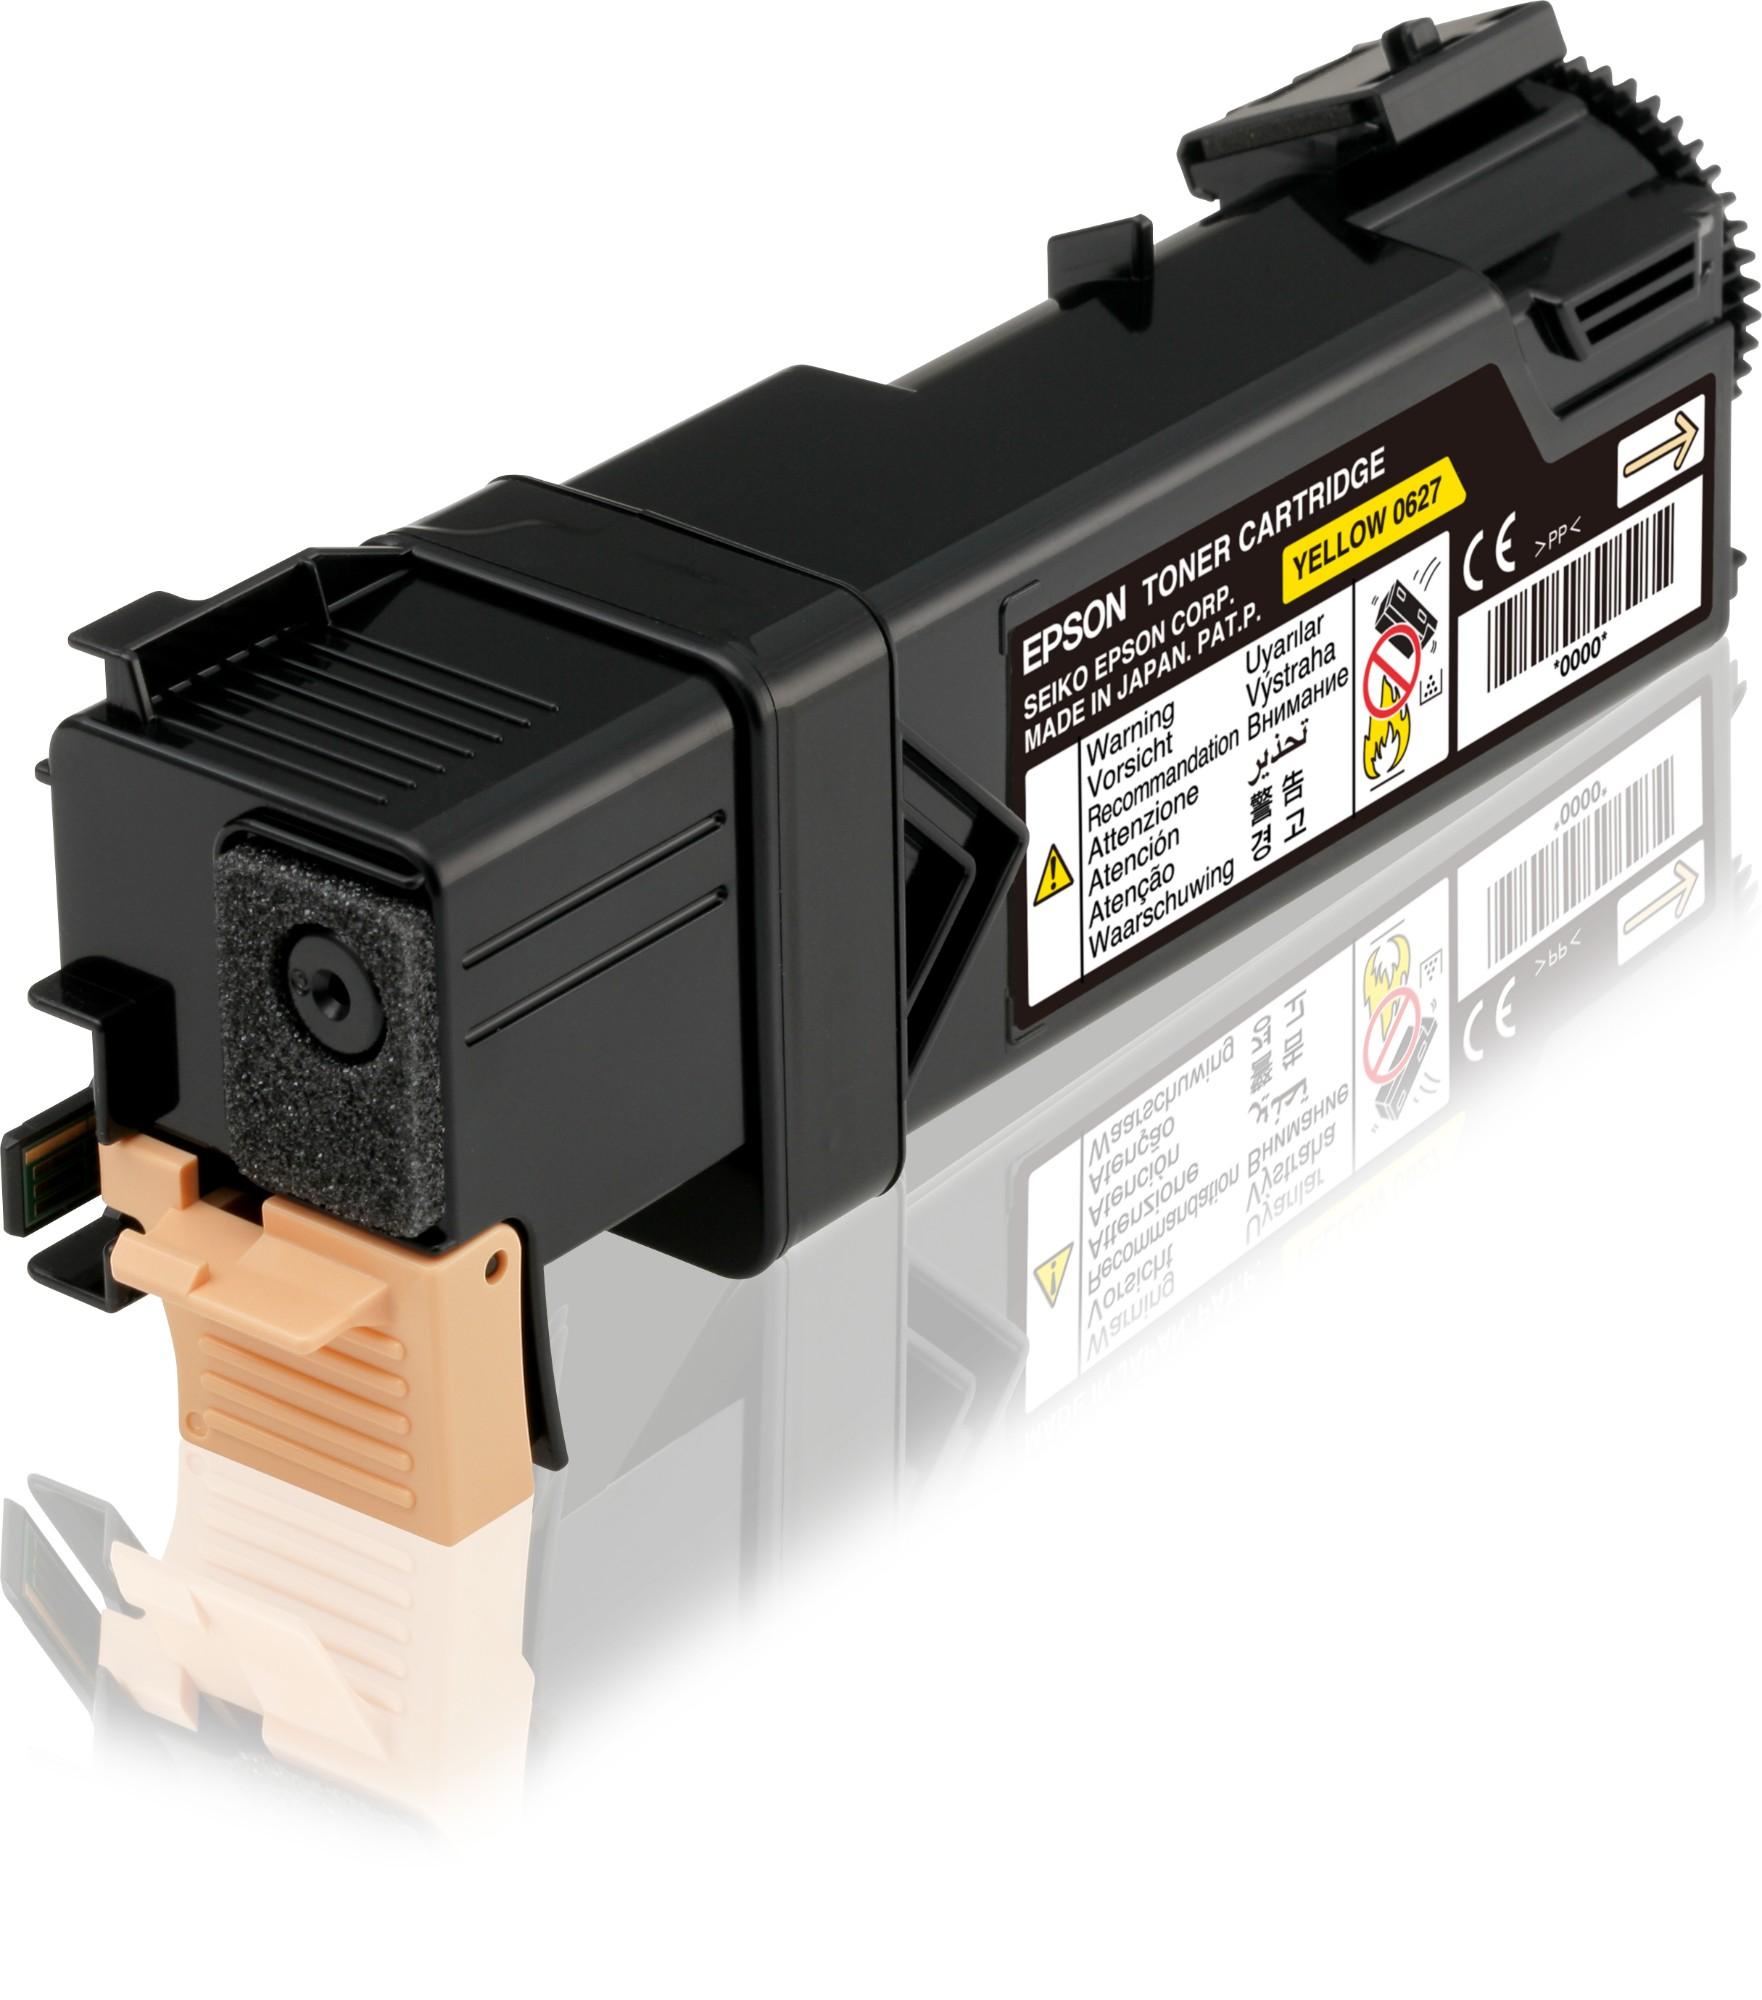 Epson Toner Cartridge Yellow 2.5k